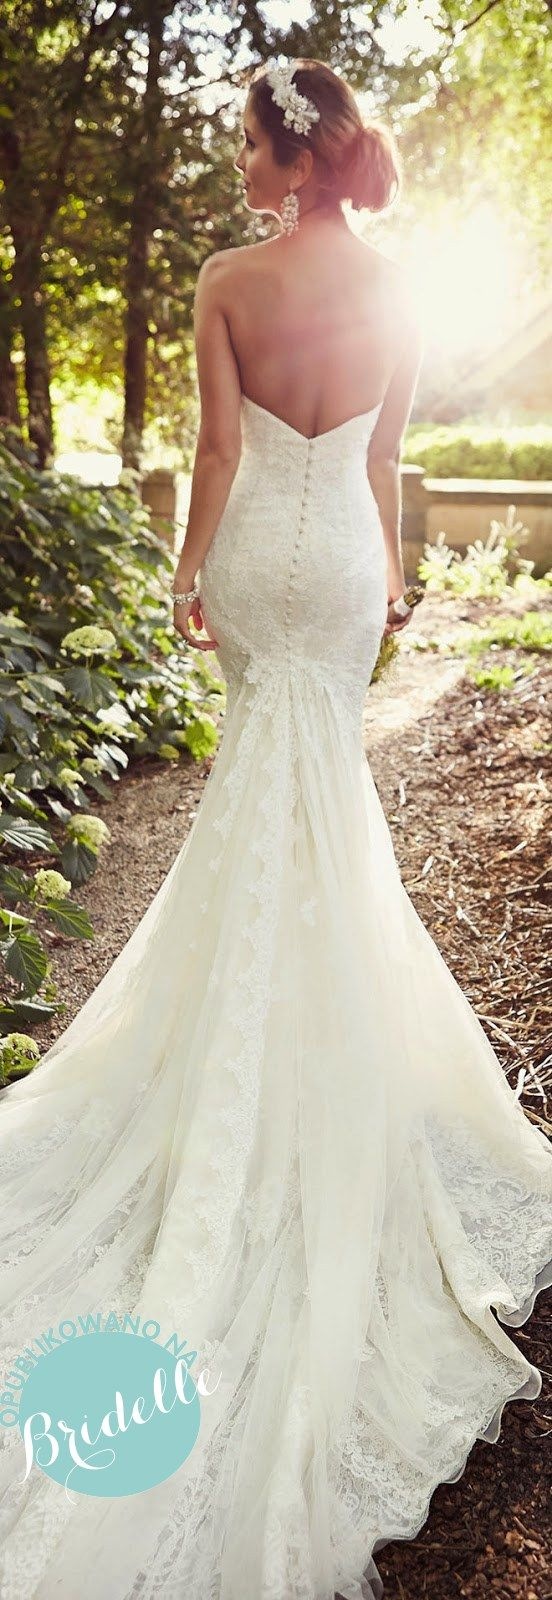 Mama june wedding dress   best Wedding Dress images on Pinterest  Groom attire Princess